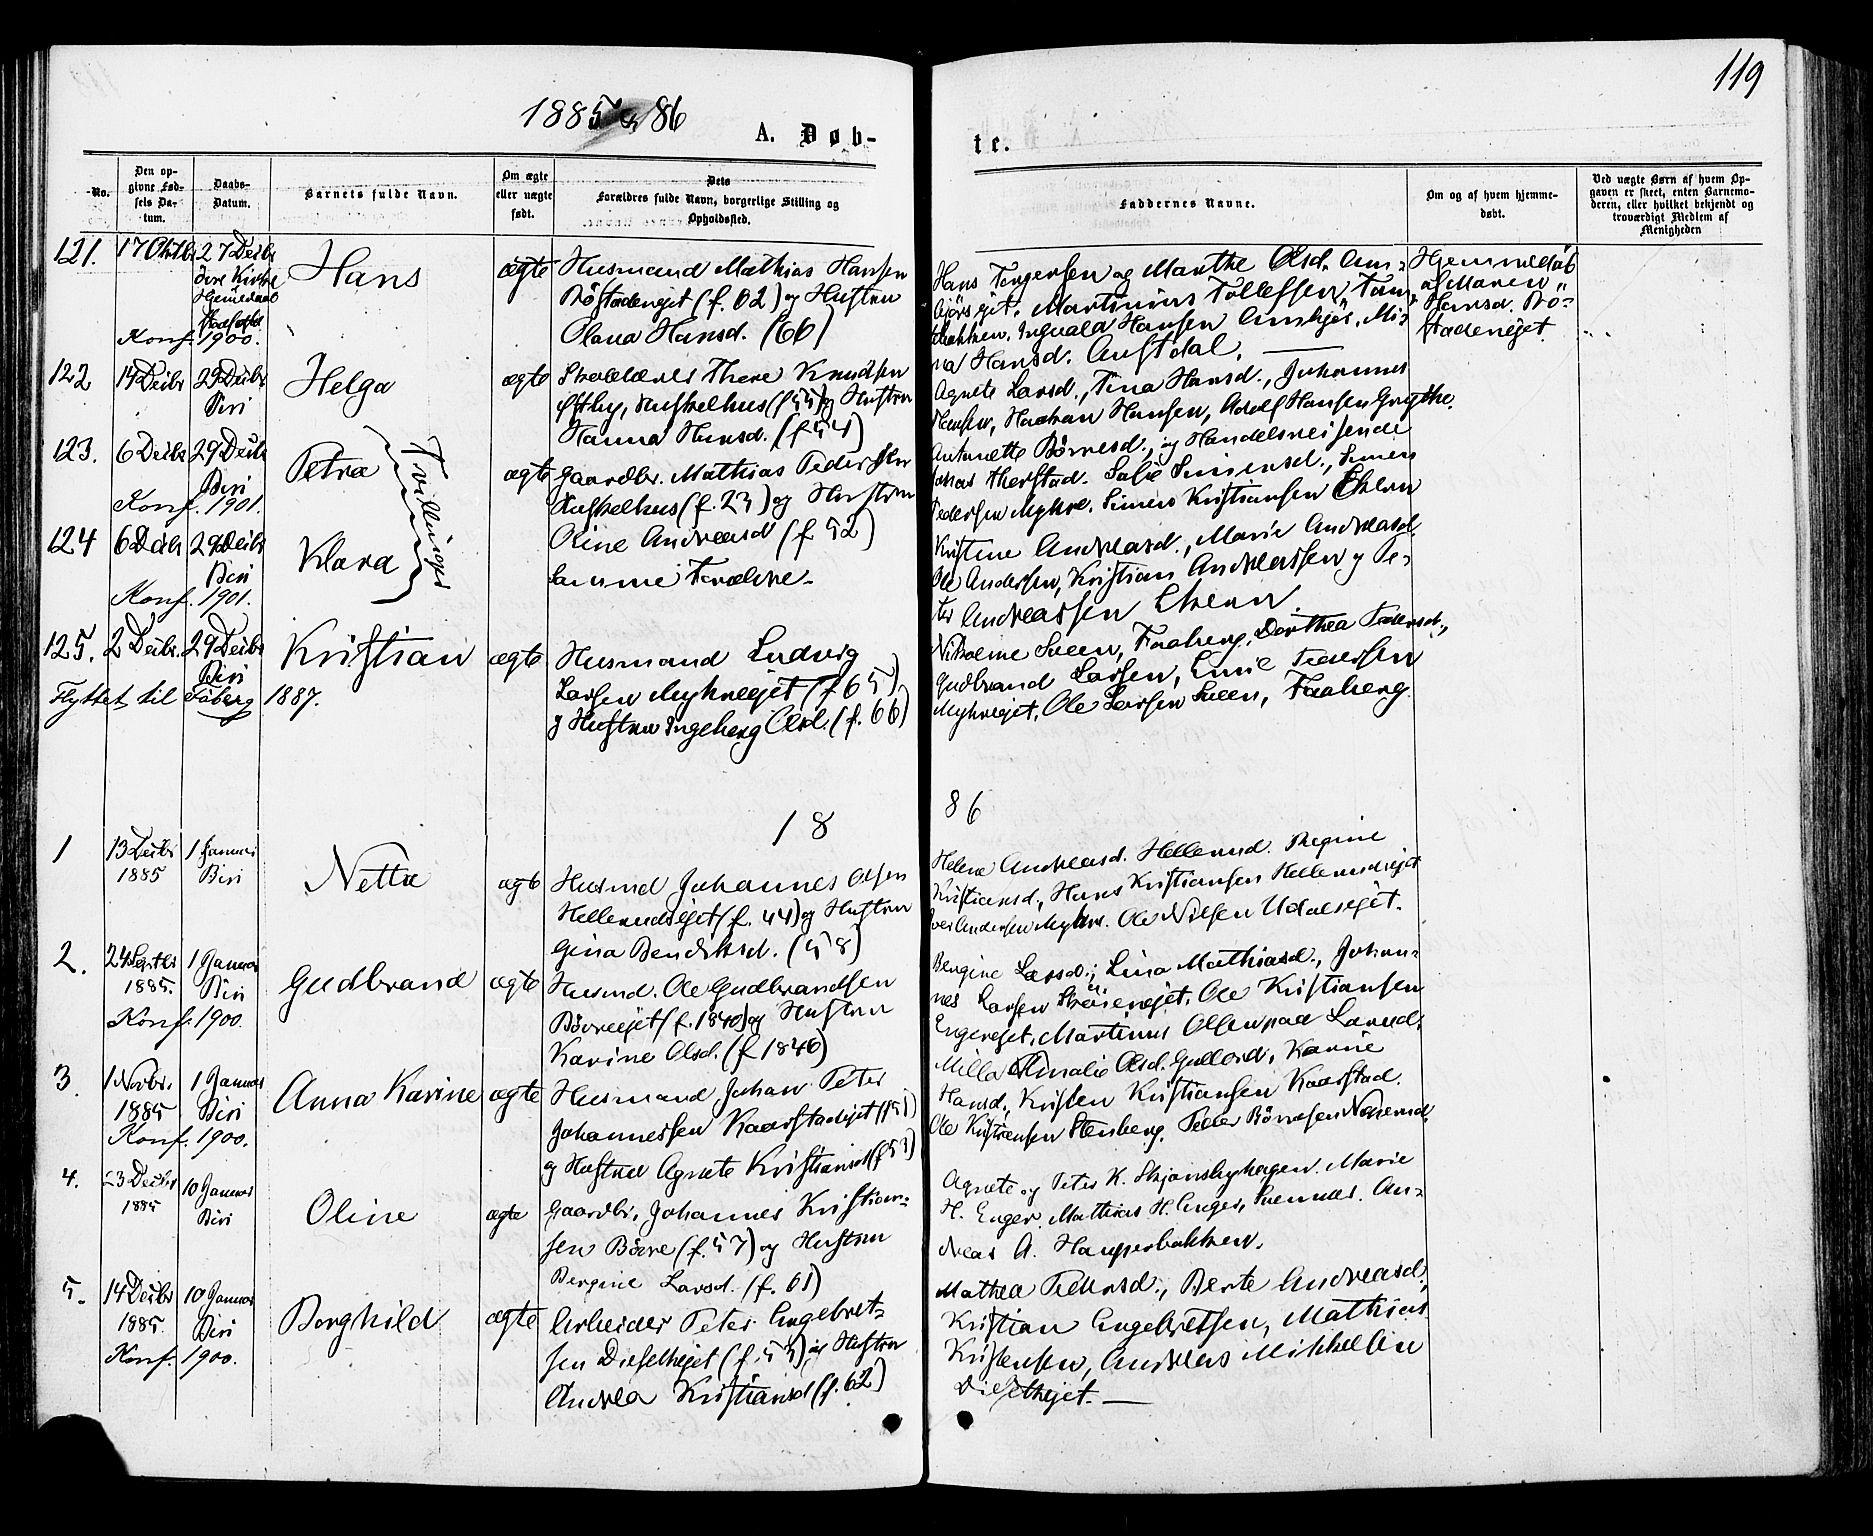 SAH, Biri prestekontor, Ministerialbok nr. 6, 1877-1886, s. 119